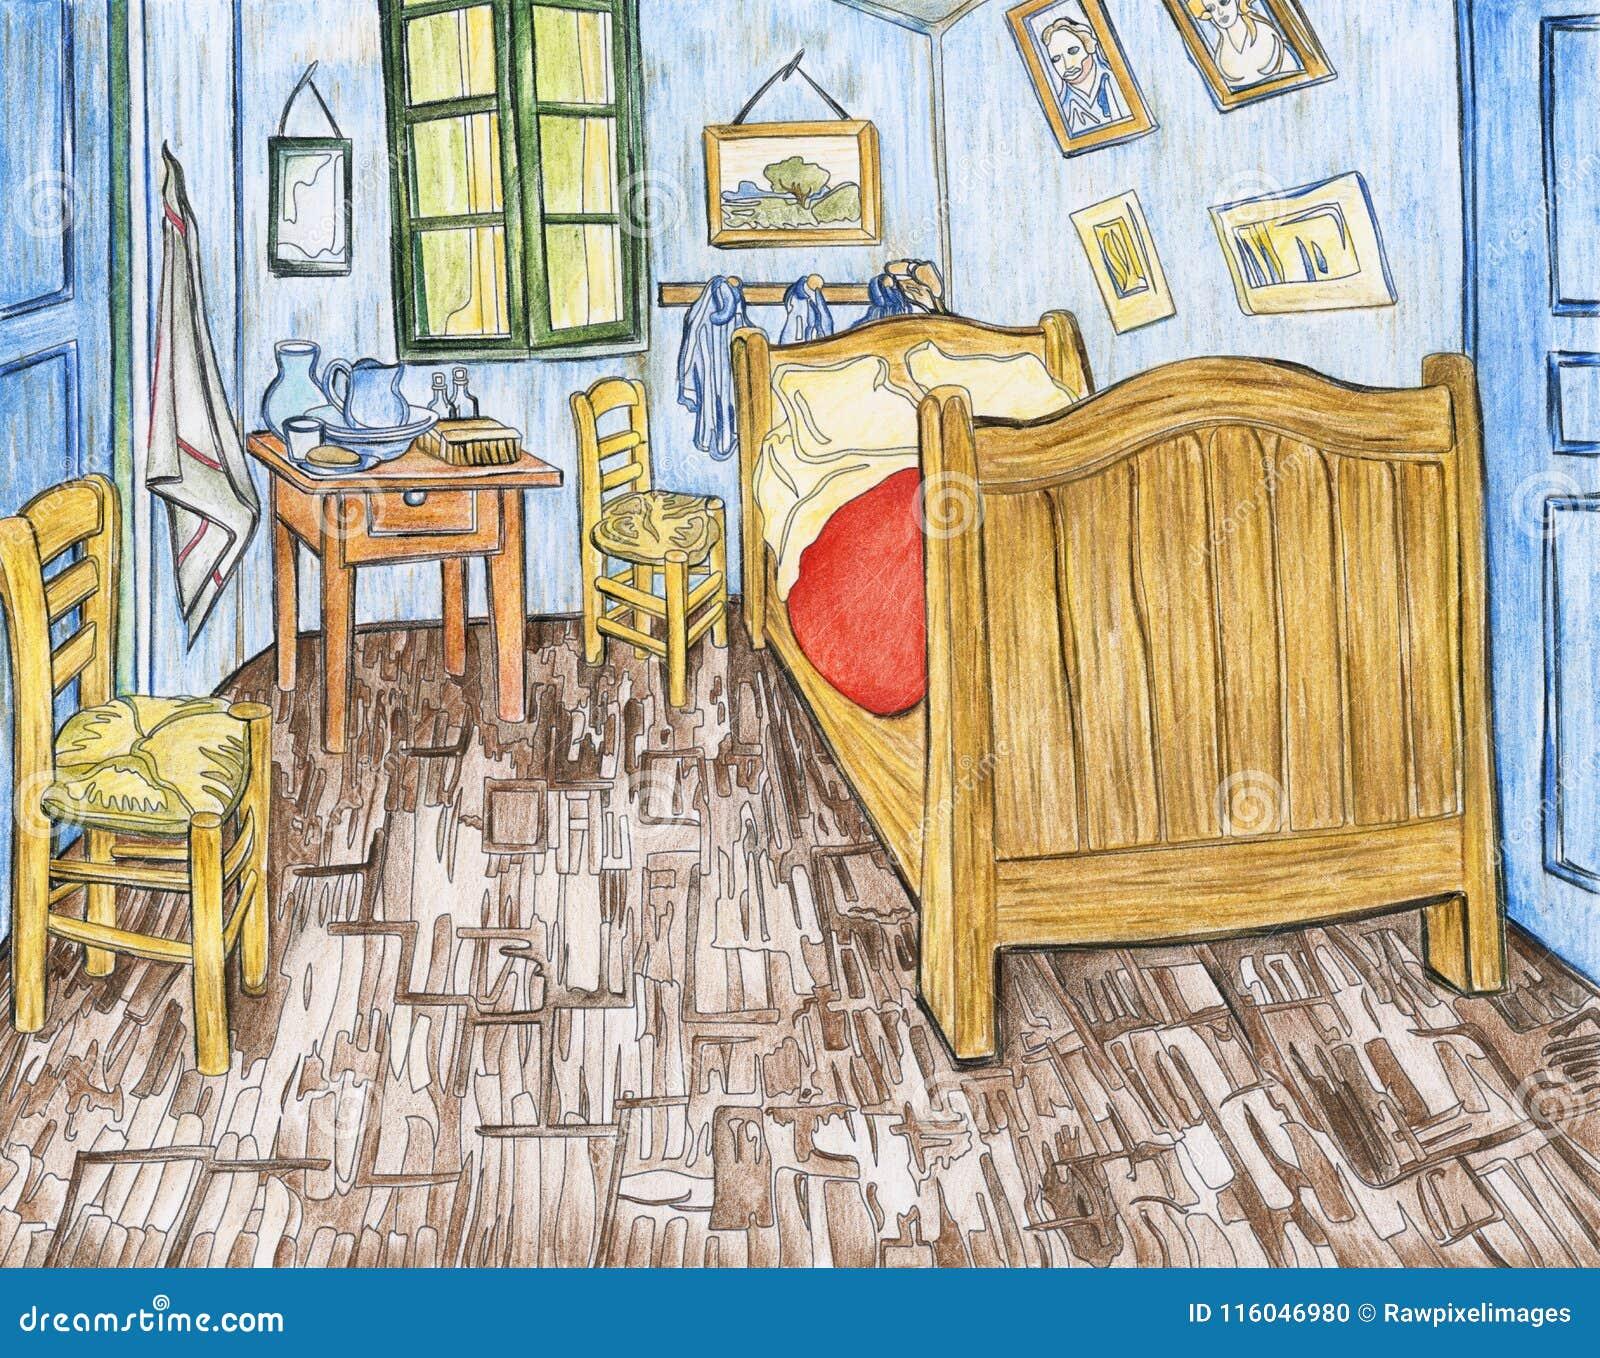 Bedroom In Arles 1888 By Vincent Van Gogh Stock Illustration Illustration Of Gogh Canvas 116046980,Kitchen Garden Window Shelf